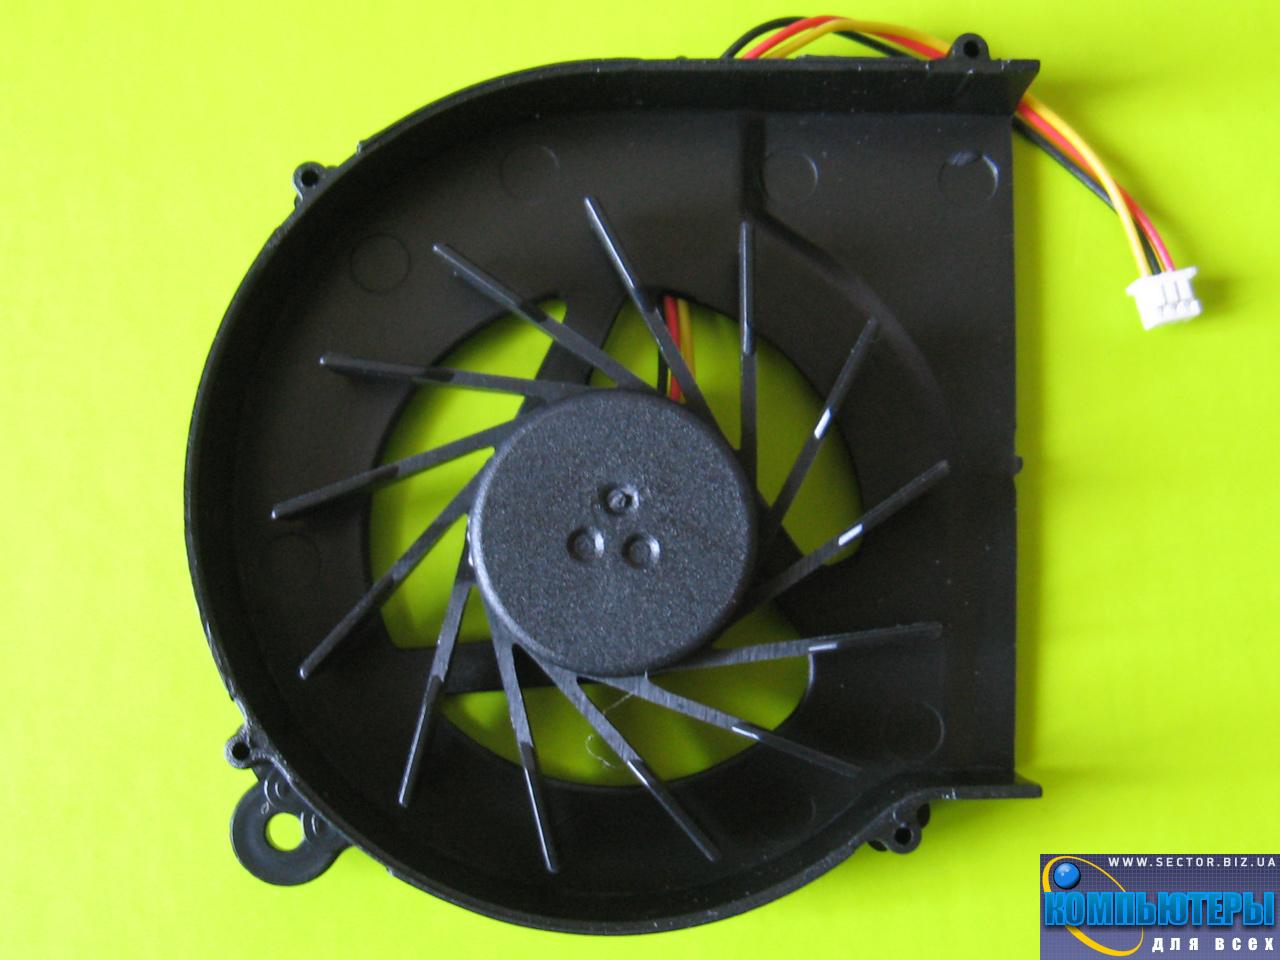 Кулер к ноутбуку HP Compaq CQ42 G42 G4 G6 G7 CQ56 G56 p/n: DFS531205HC0T. Фото № 2.